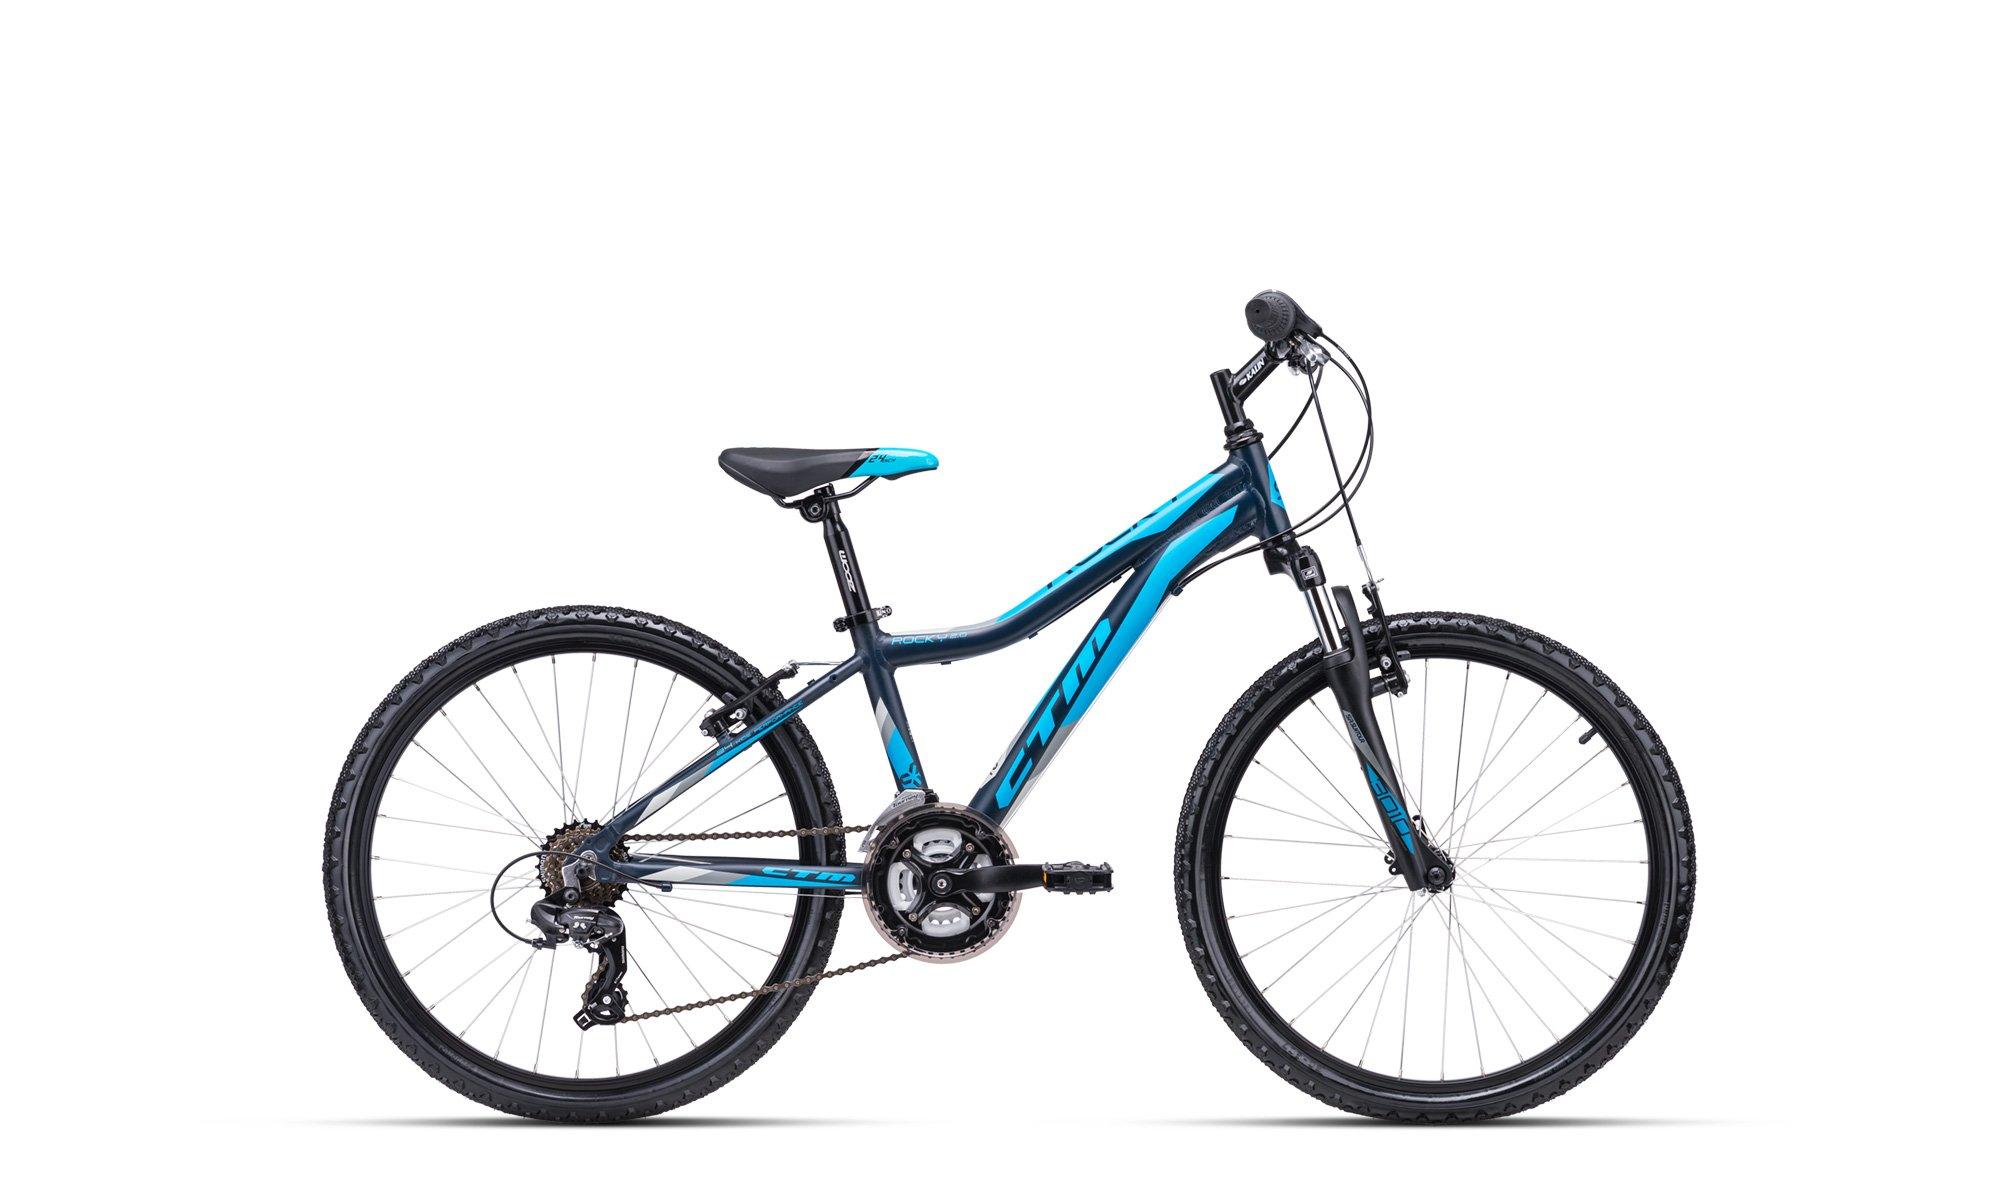 Bērnu divritenis velosipēds CTM Rocky 2.0 24 collas